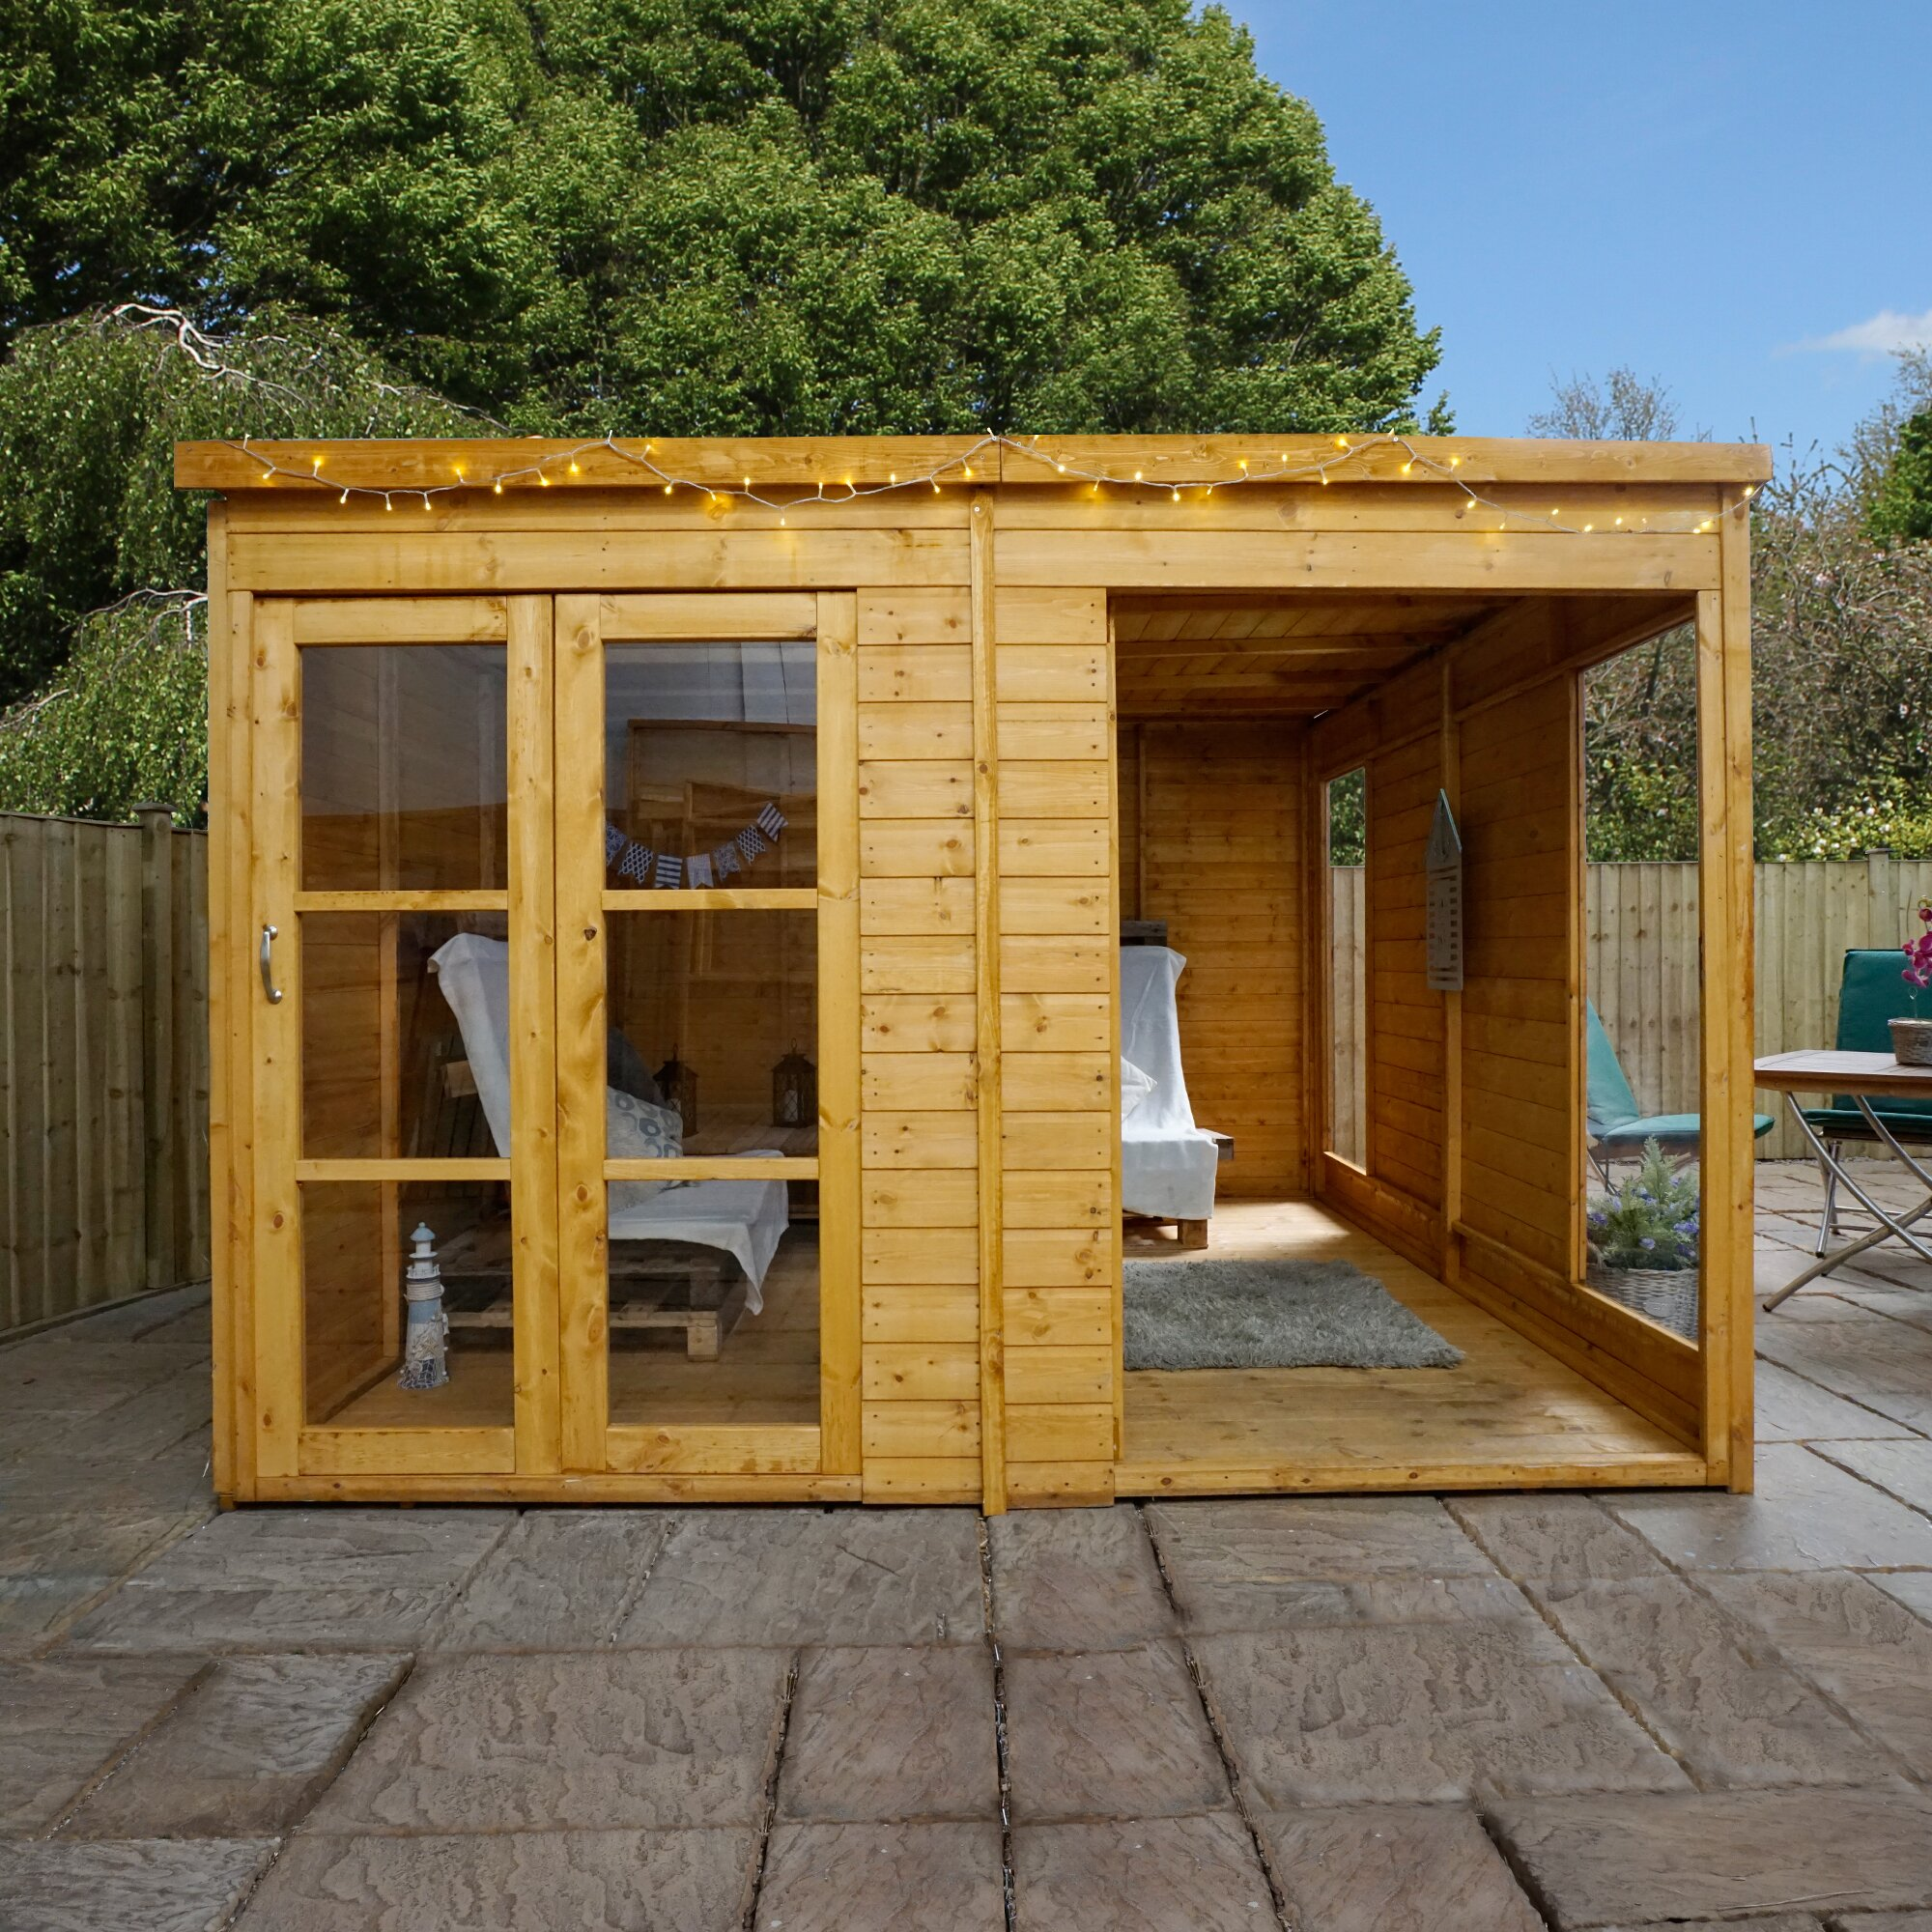 Mercia Garden Products 10 x 10 Garden Room Summerhouse